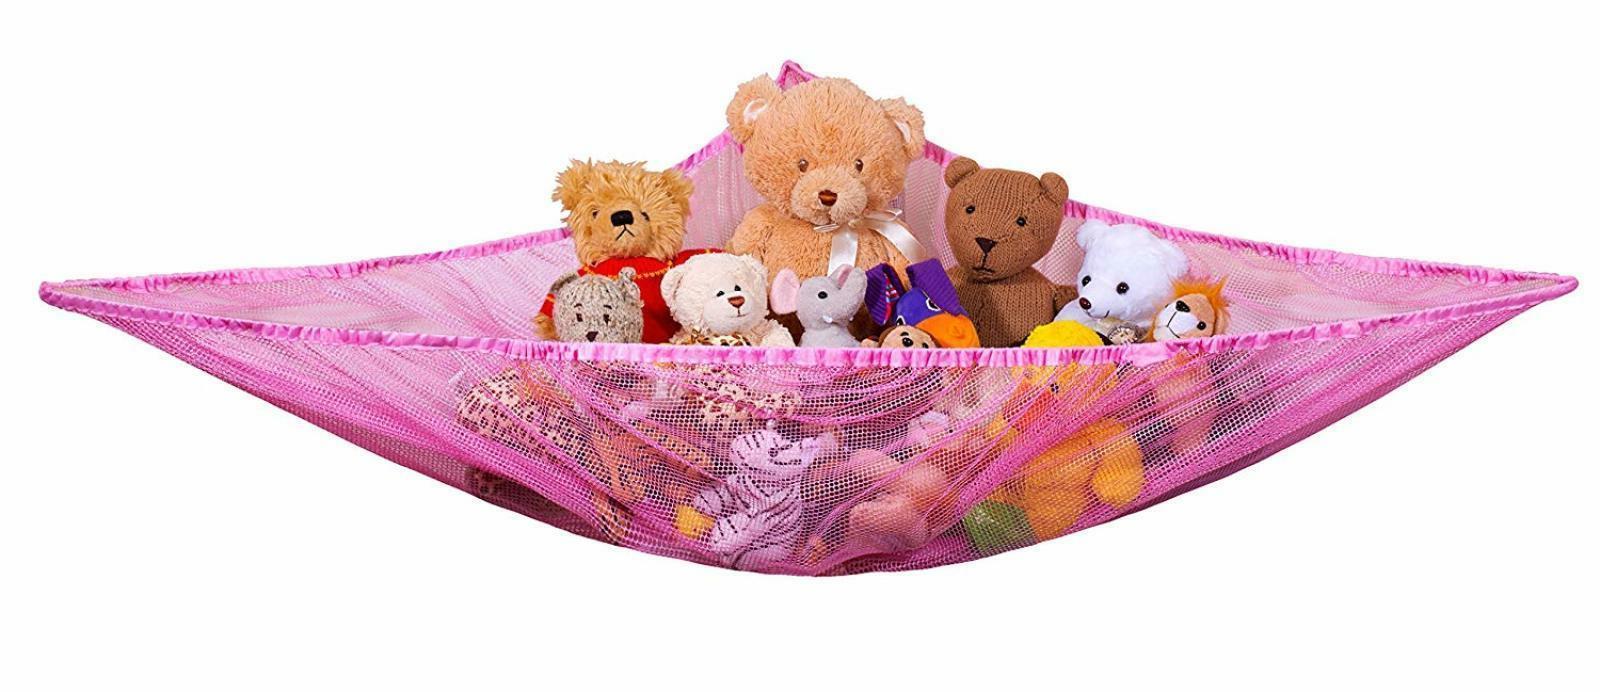 Jumbo Toy Hammock Organize stuffed animals or children's toy